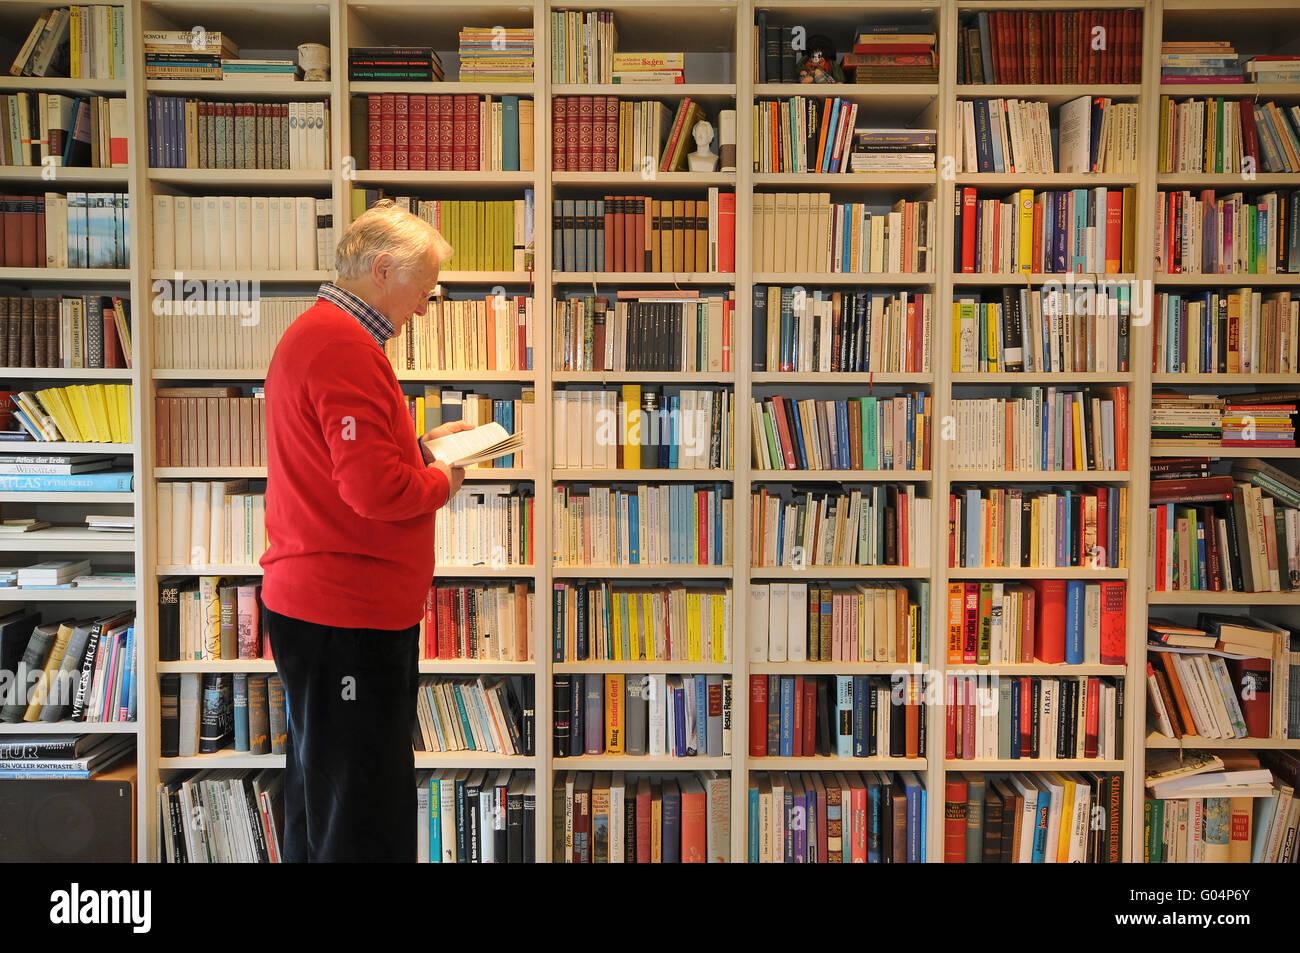 Regal mit Büchern. Stockbild